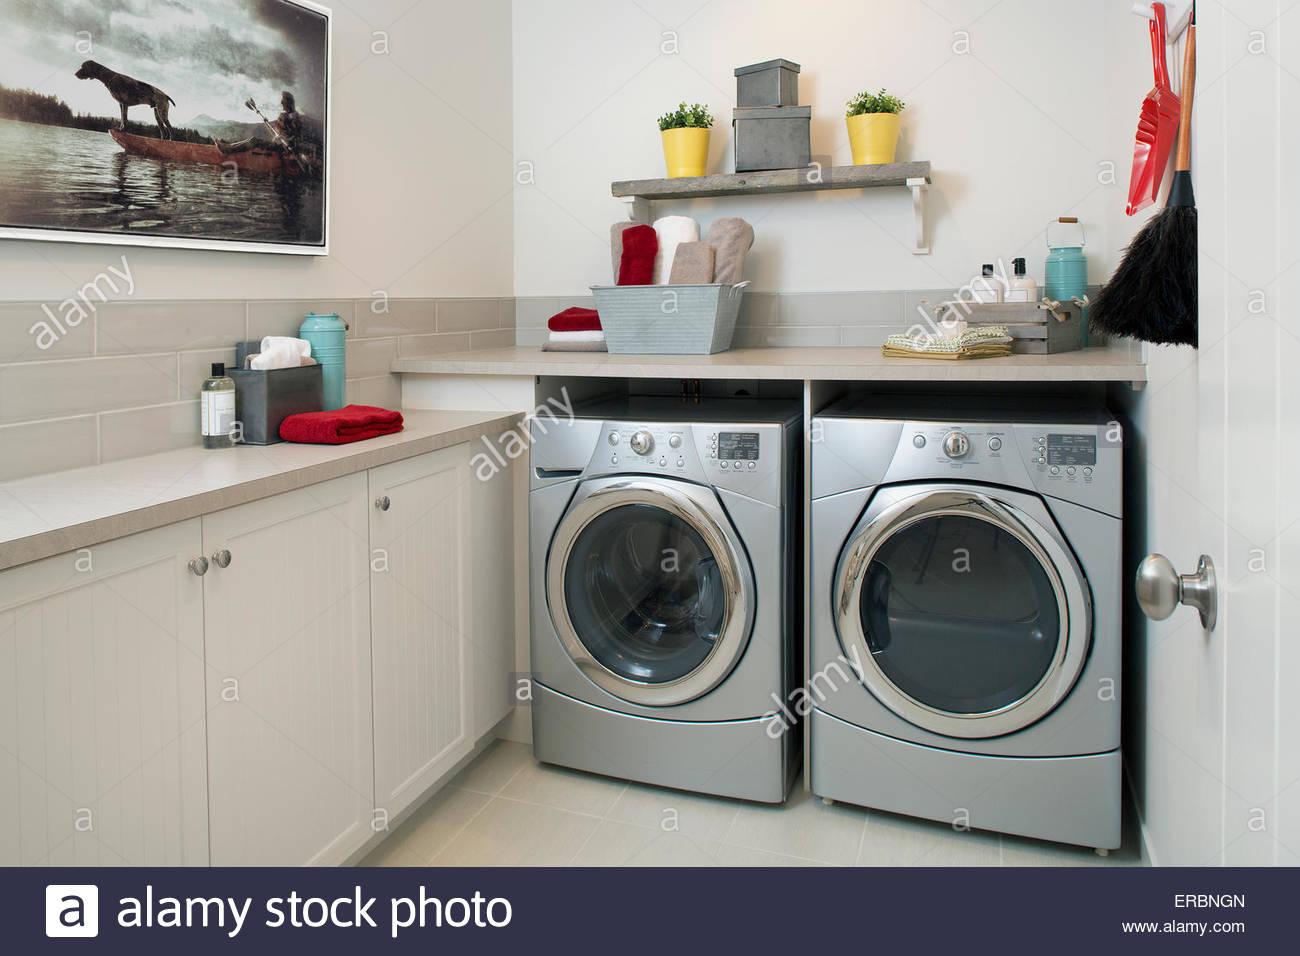 Energy efficient washing machine and dryer laundry room - Stock Image